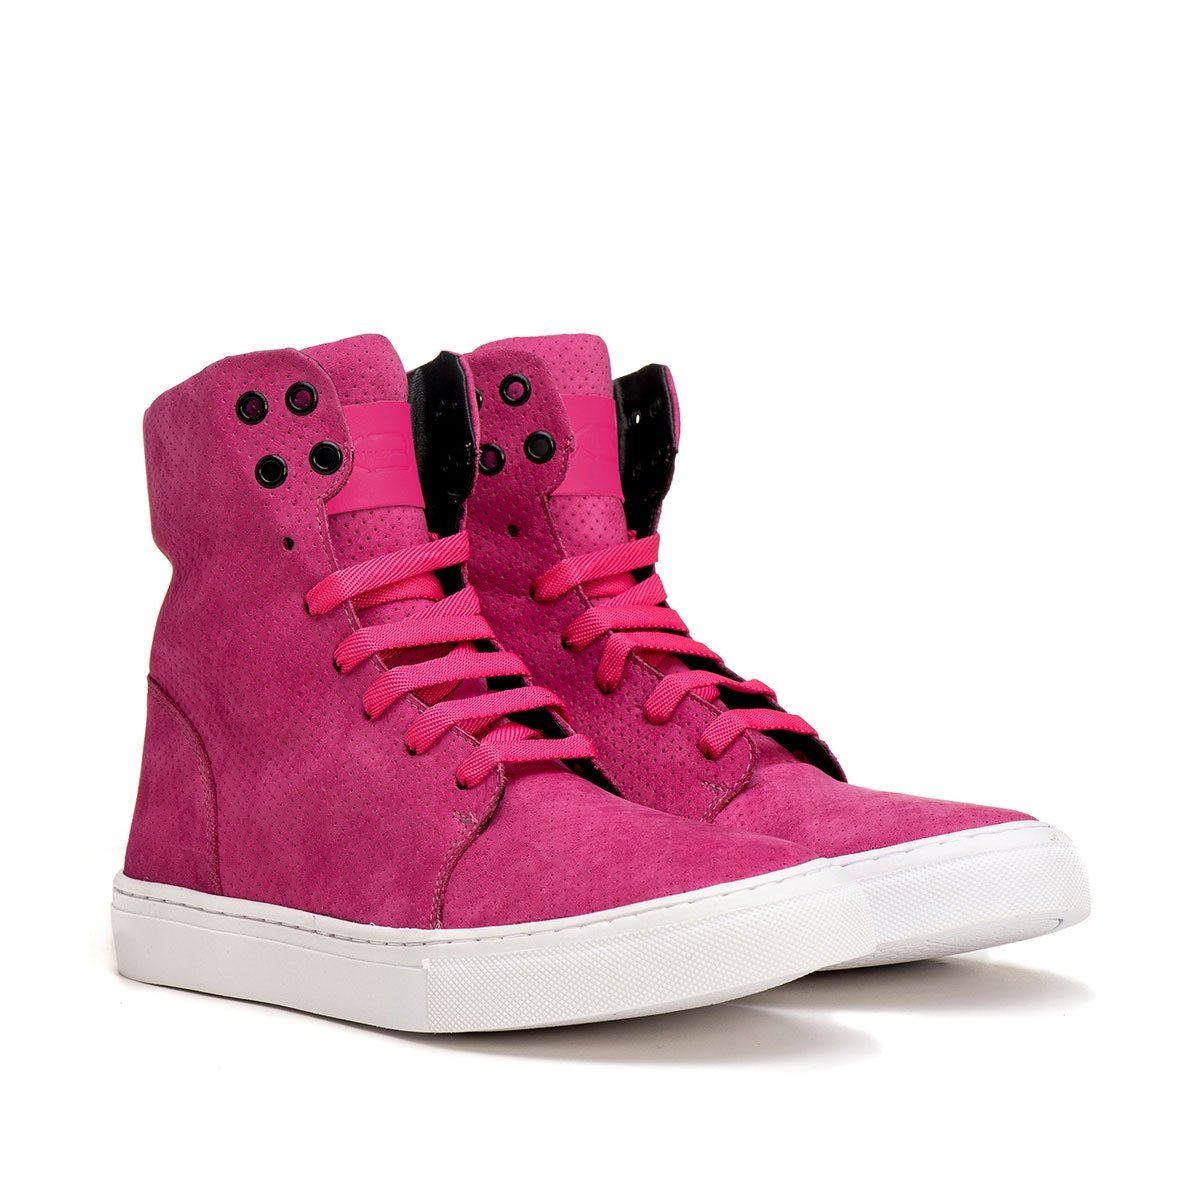 em Style K3 Feminino Fitness Fitness Pink Feminino Couro em K3 Style Tênis Tênis vqRCqnF